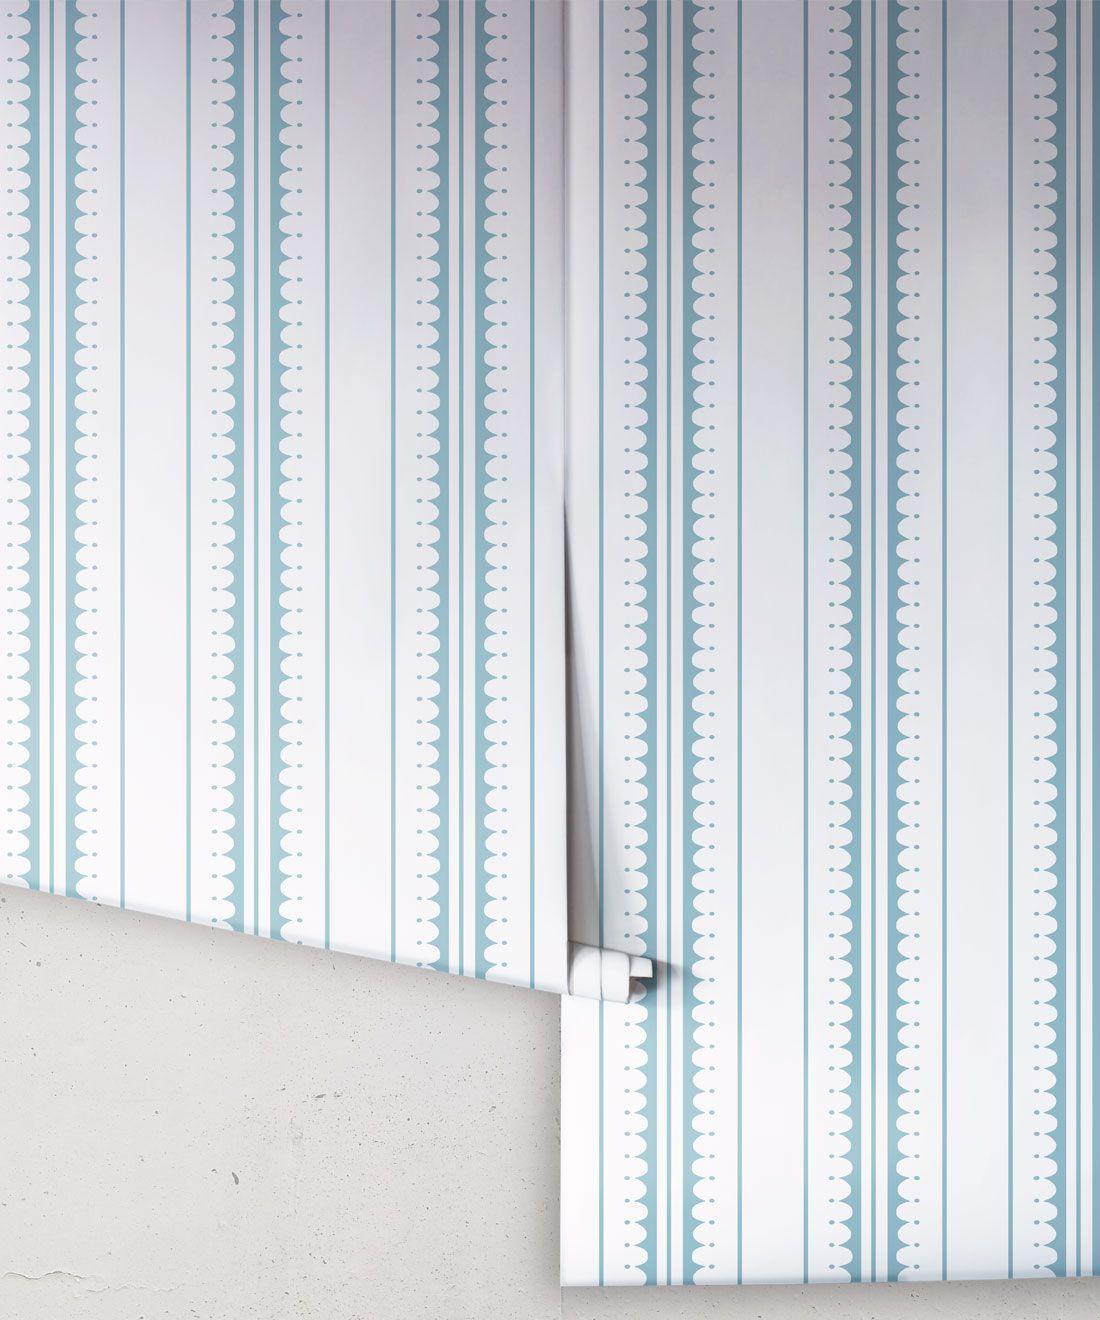 Coquille Wallpaper • Stripe and Scallop Wallpaper • Powder Blue • Rolls